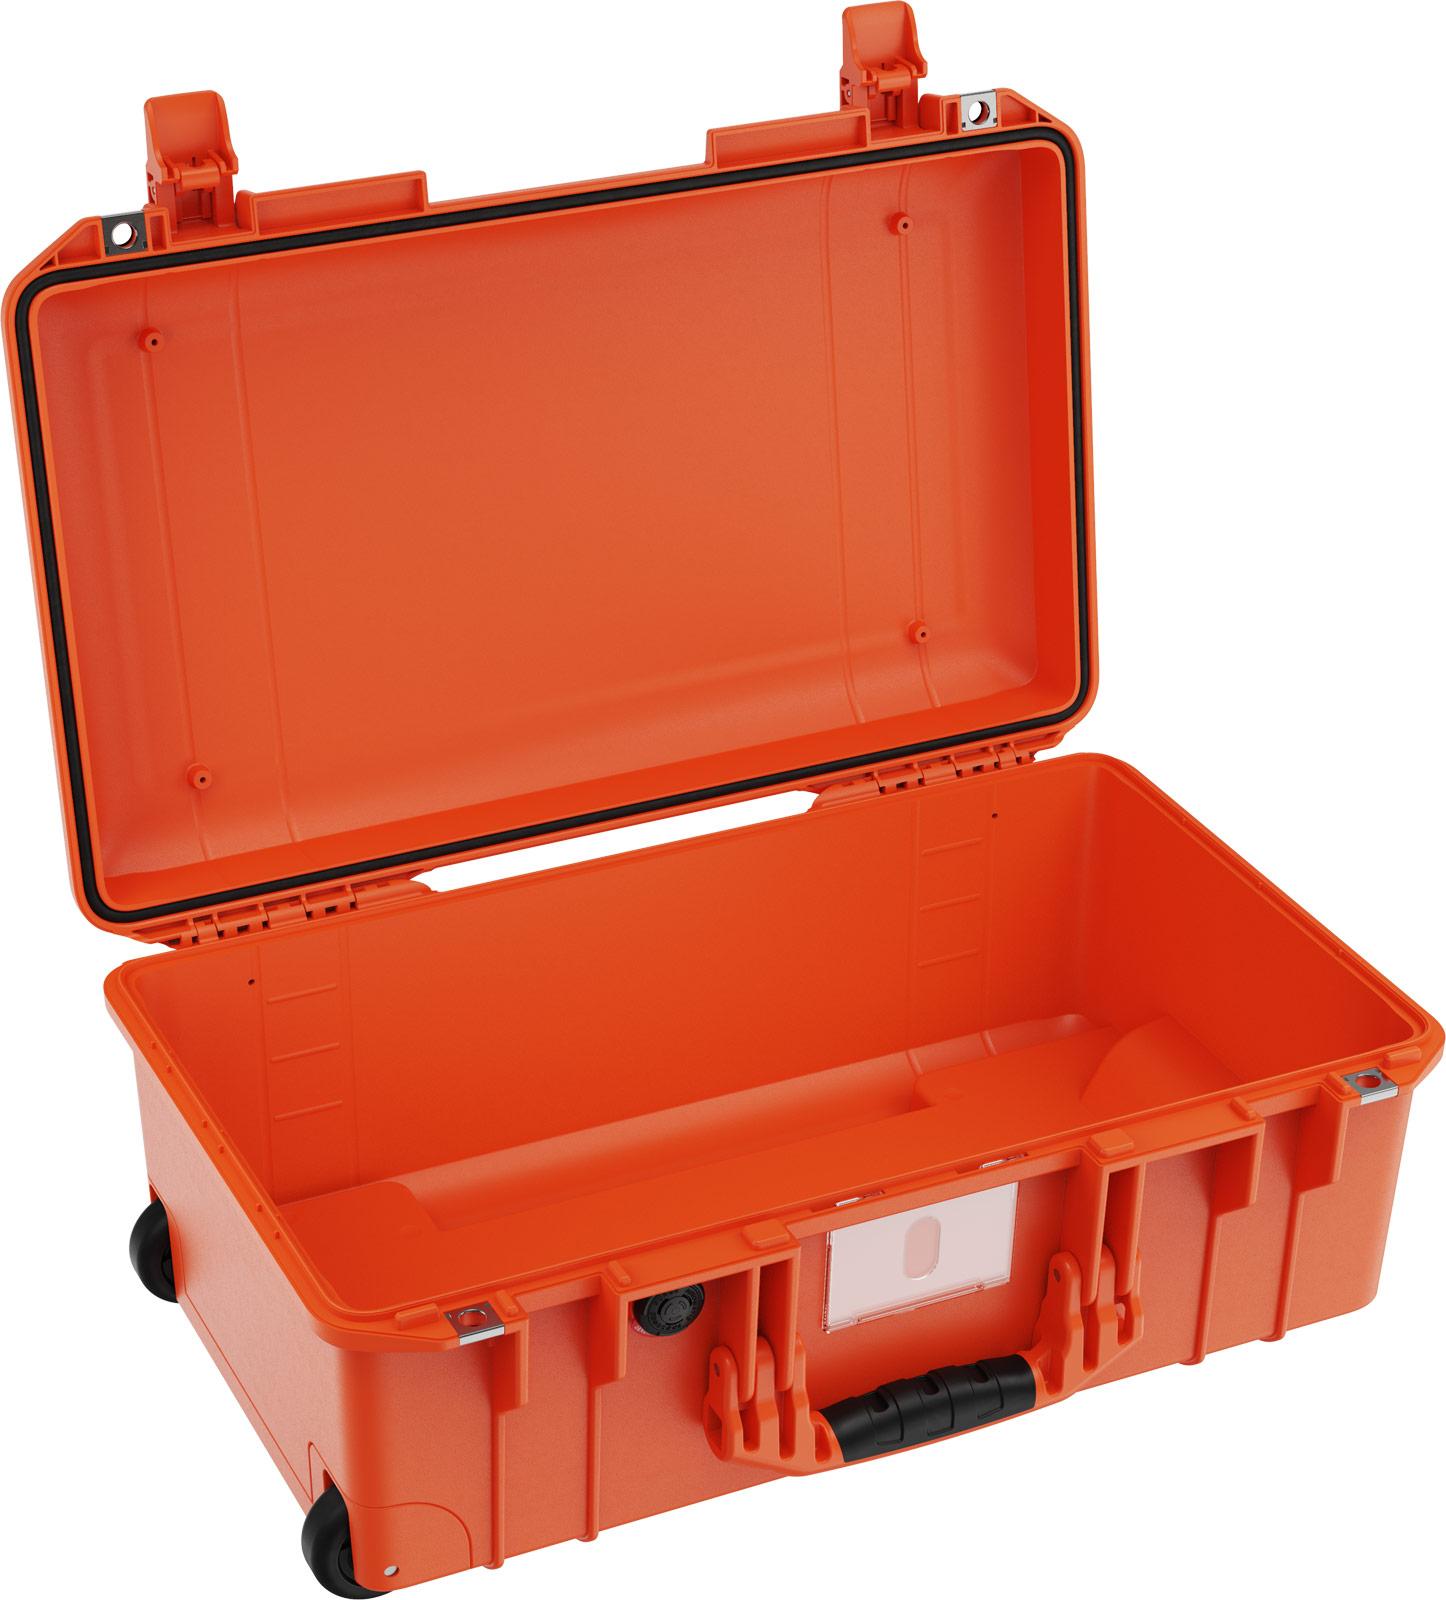 pelican air 1535 orange portable camera case